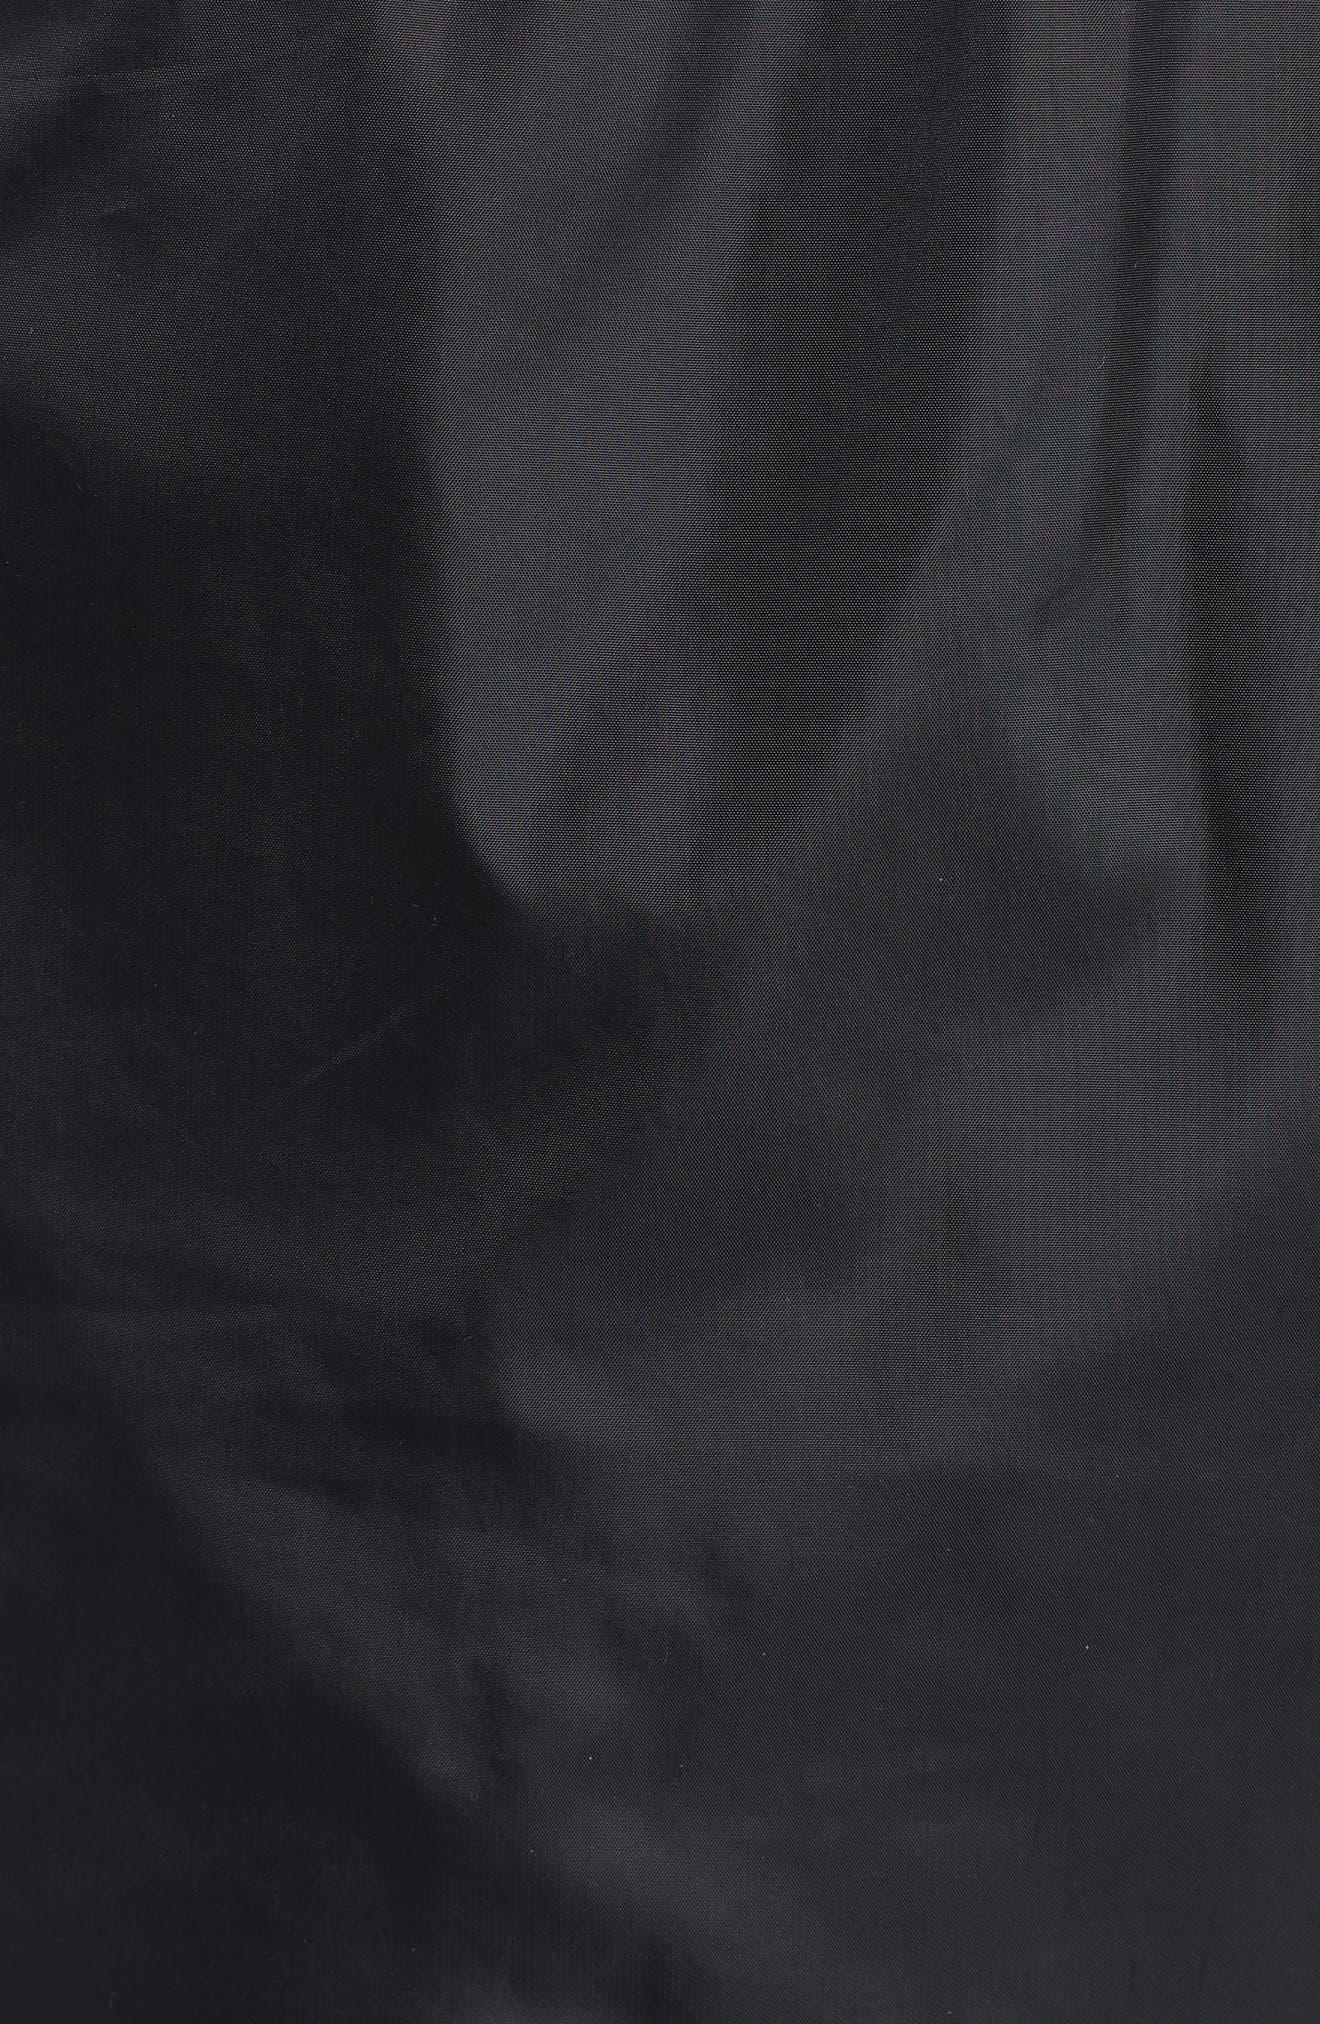 UNDER ARMOUR,                             Sportstyle Wind Pants,                             Alternate thumbnail 5, color,                             BLACK